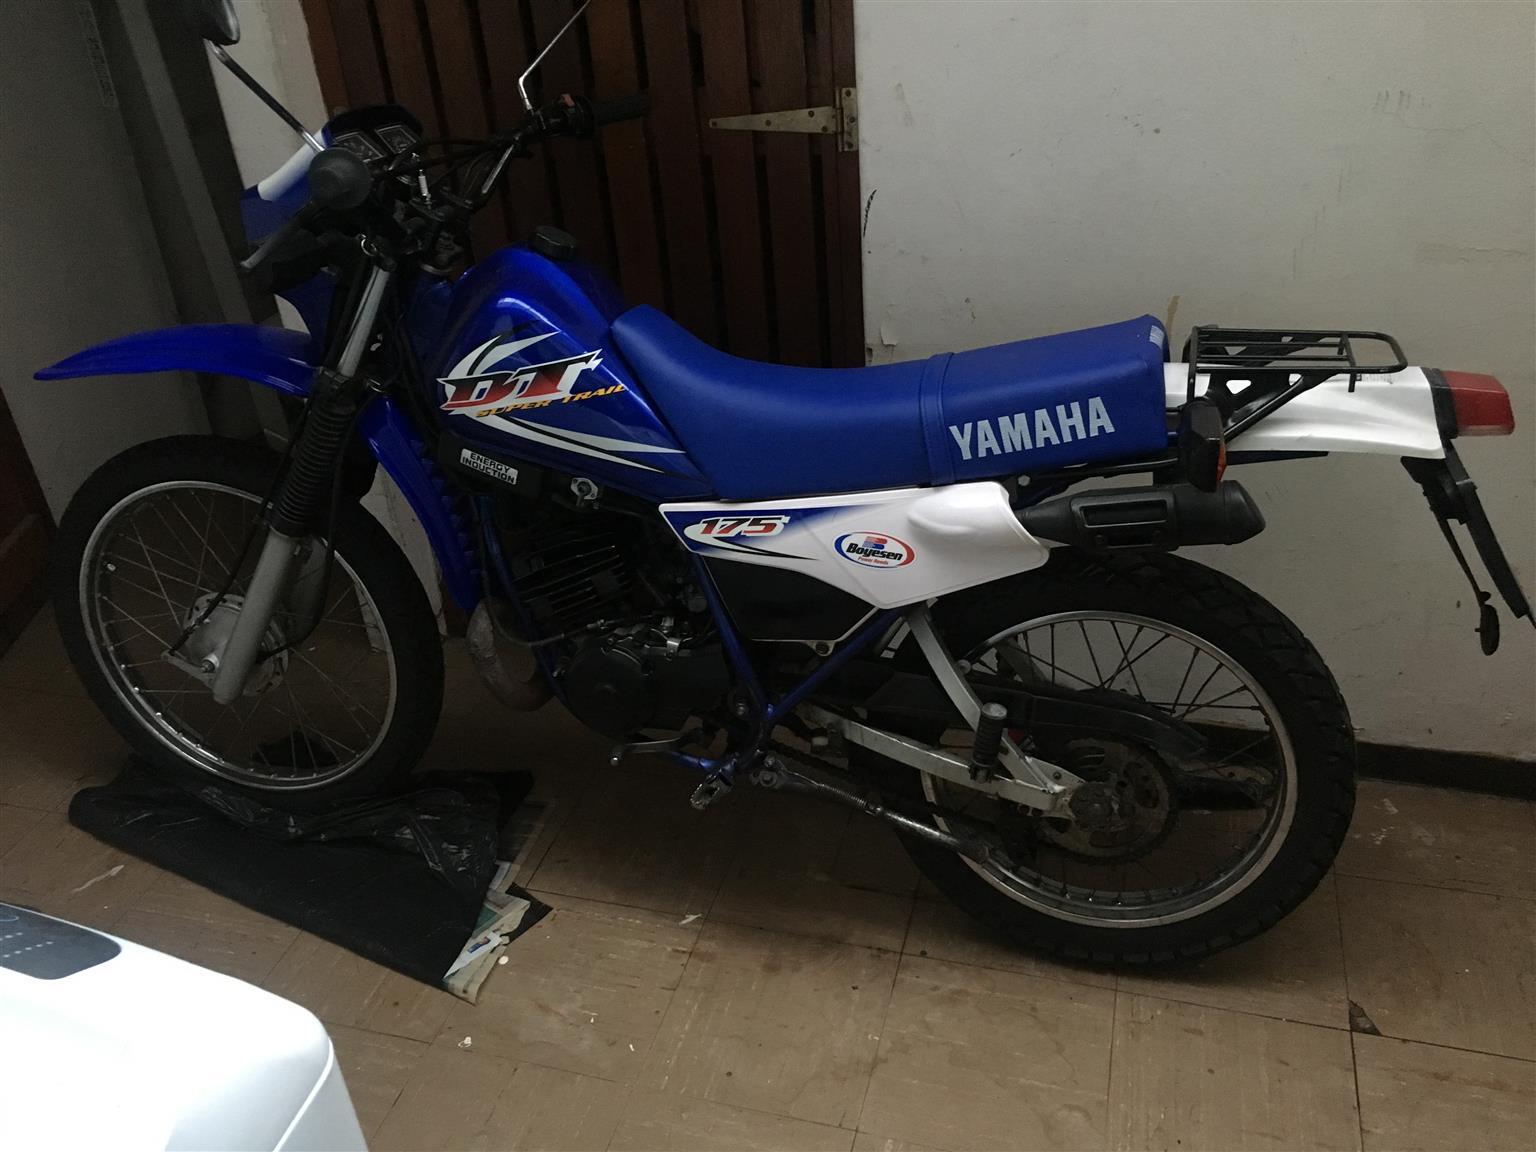 2008 Yamaha DT 200